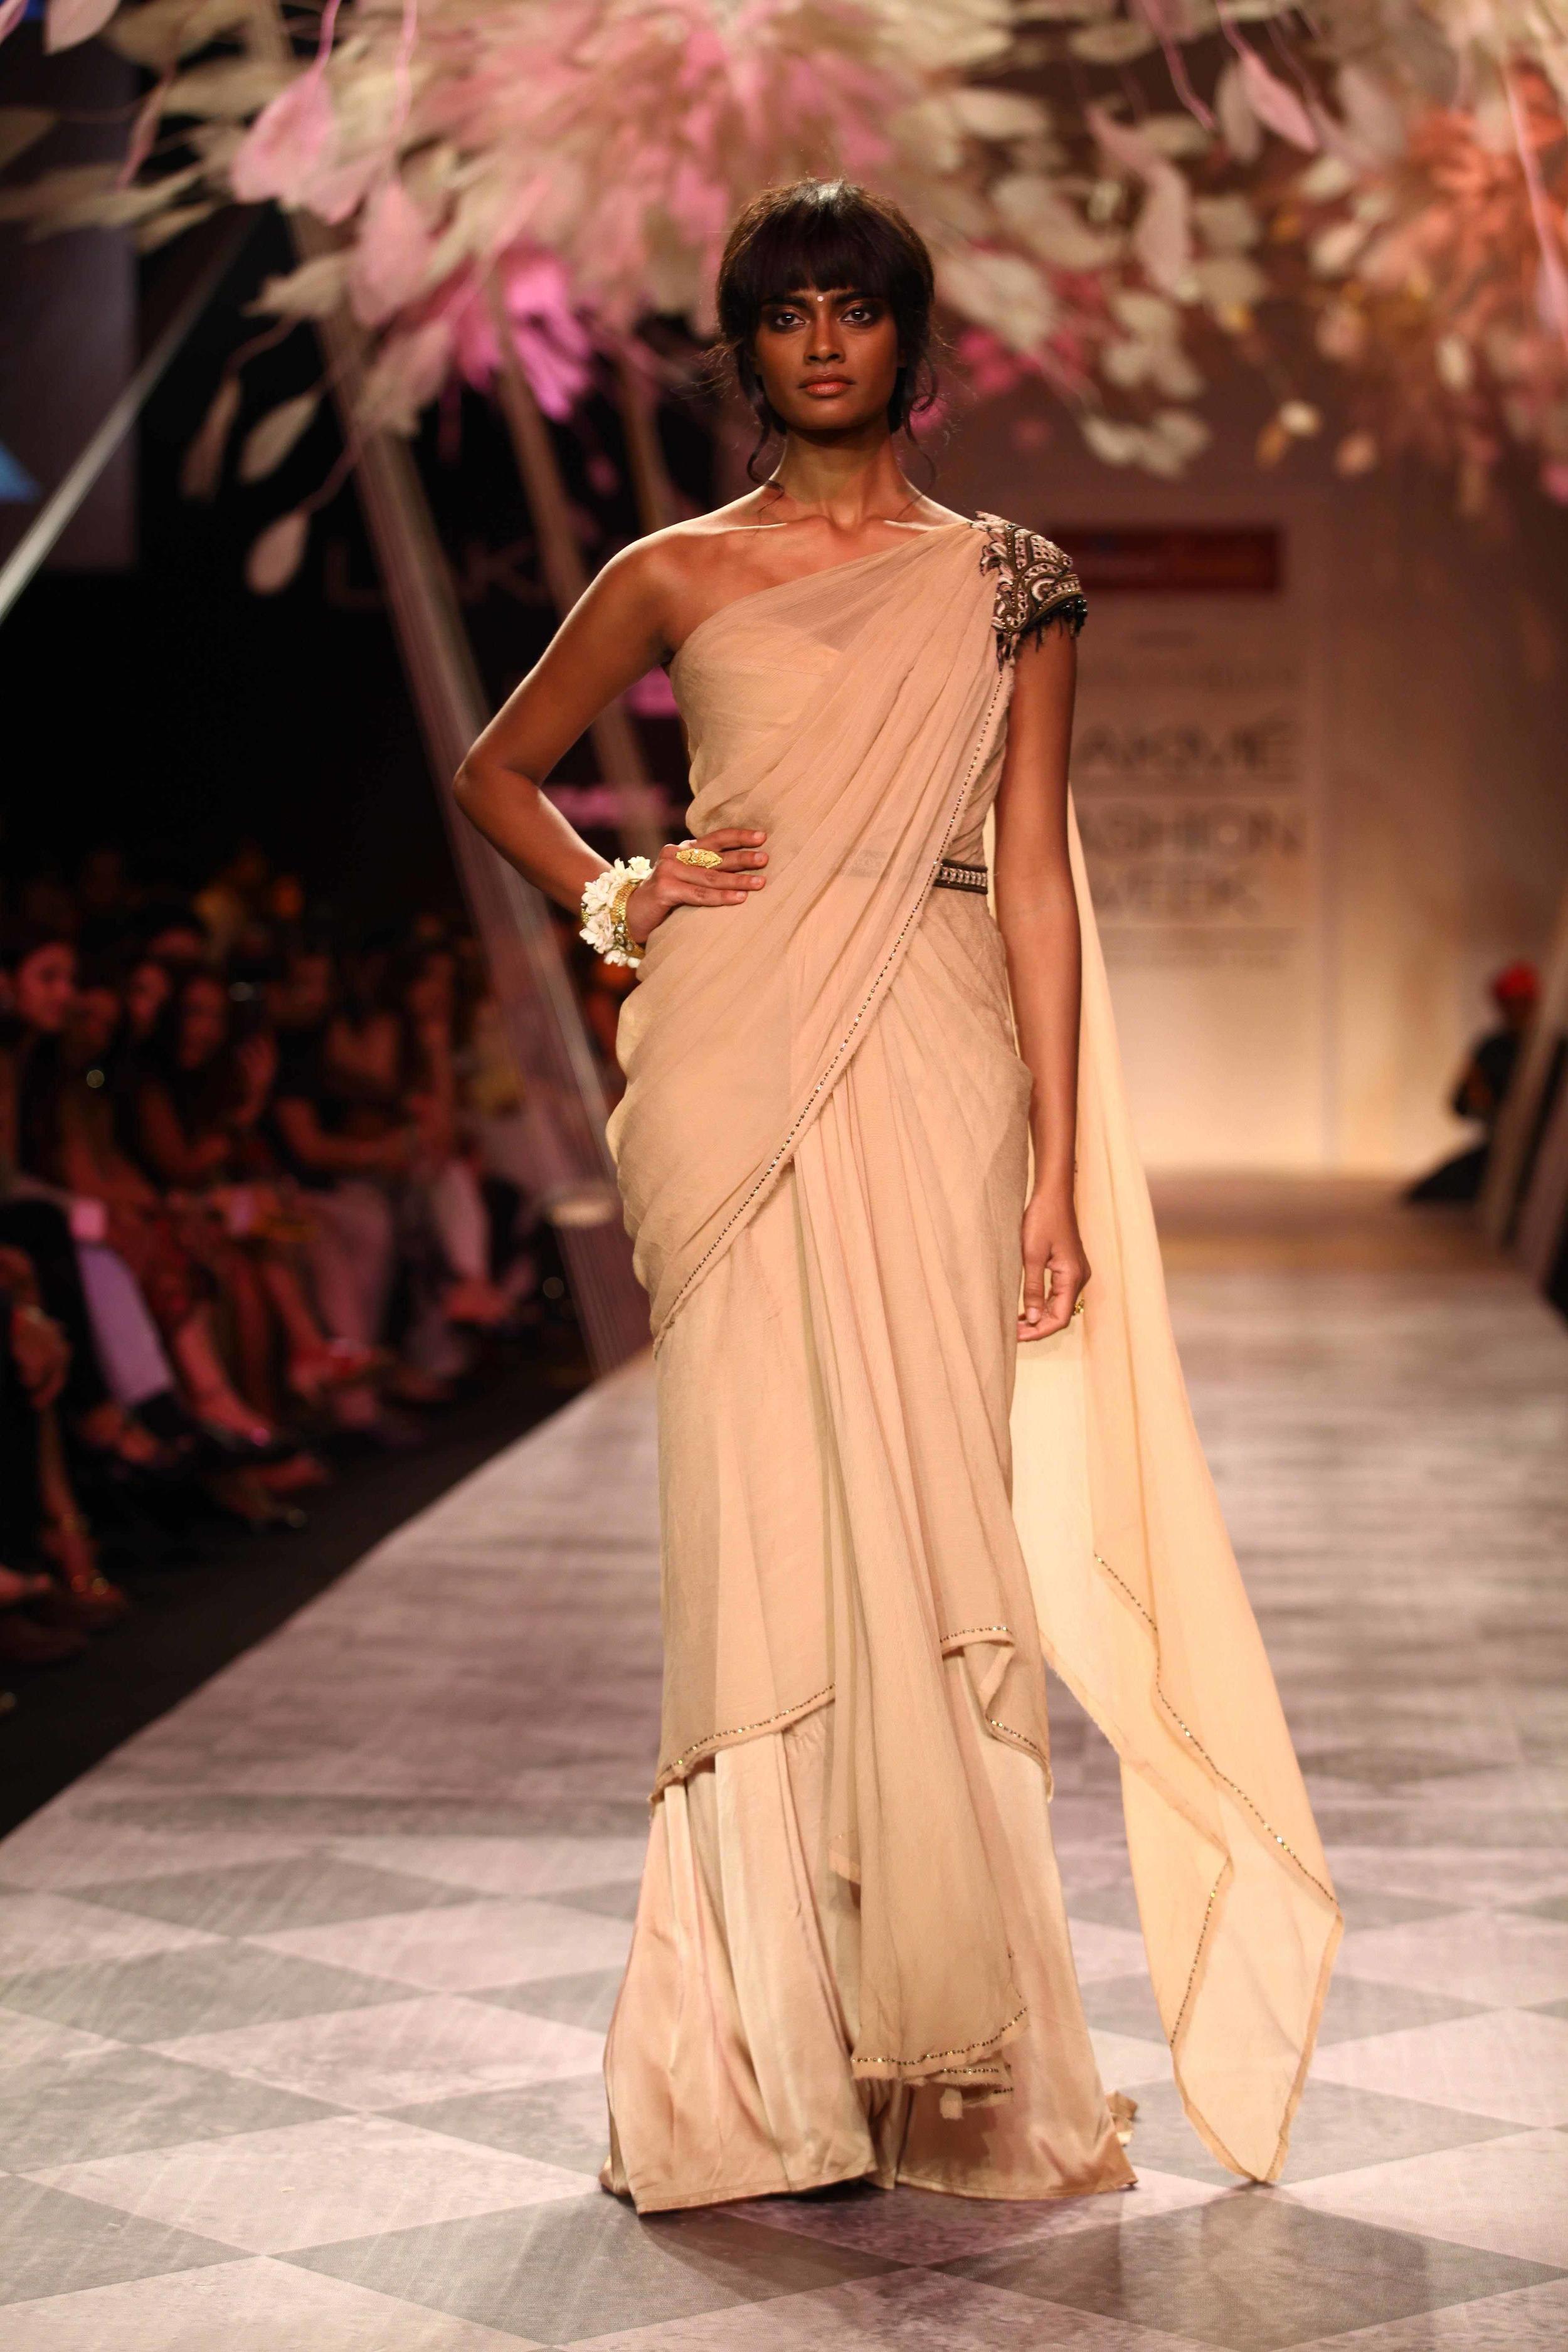 Tarun Tahiliani SS'14 Collection at LFW SR 2014 15.jpg